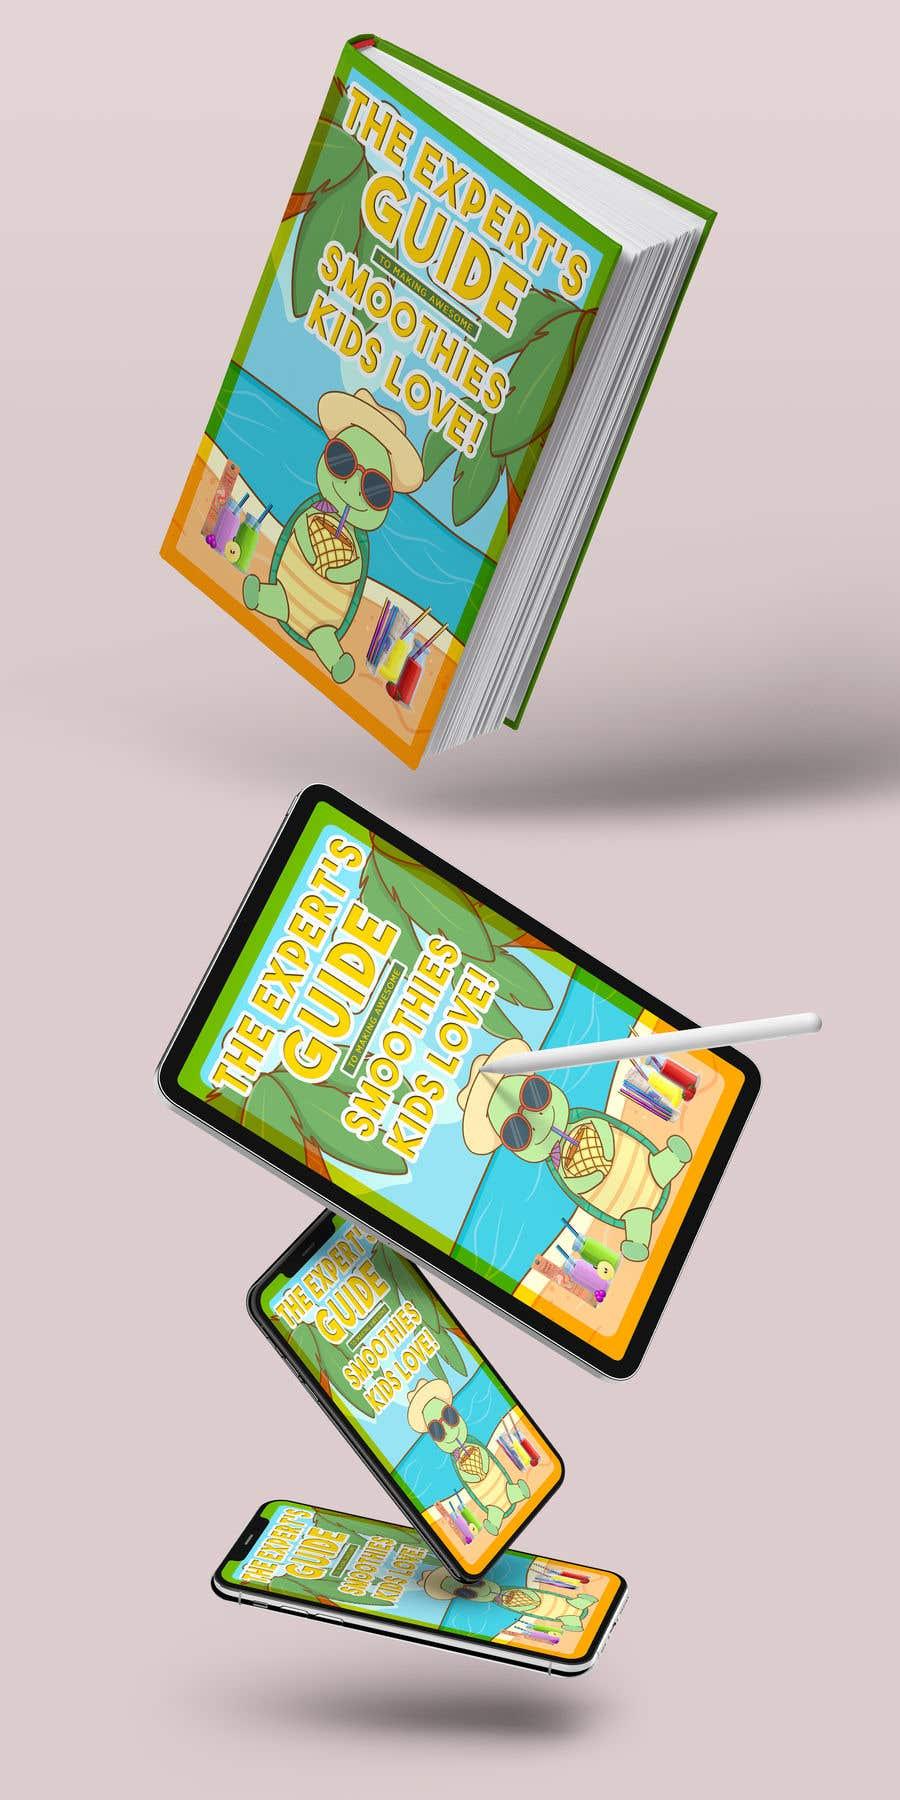 Kilpailutyö #43 kilpailussa Created us a Smoothie Ebook Cover